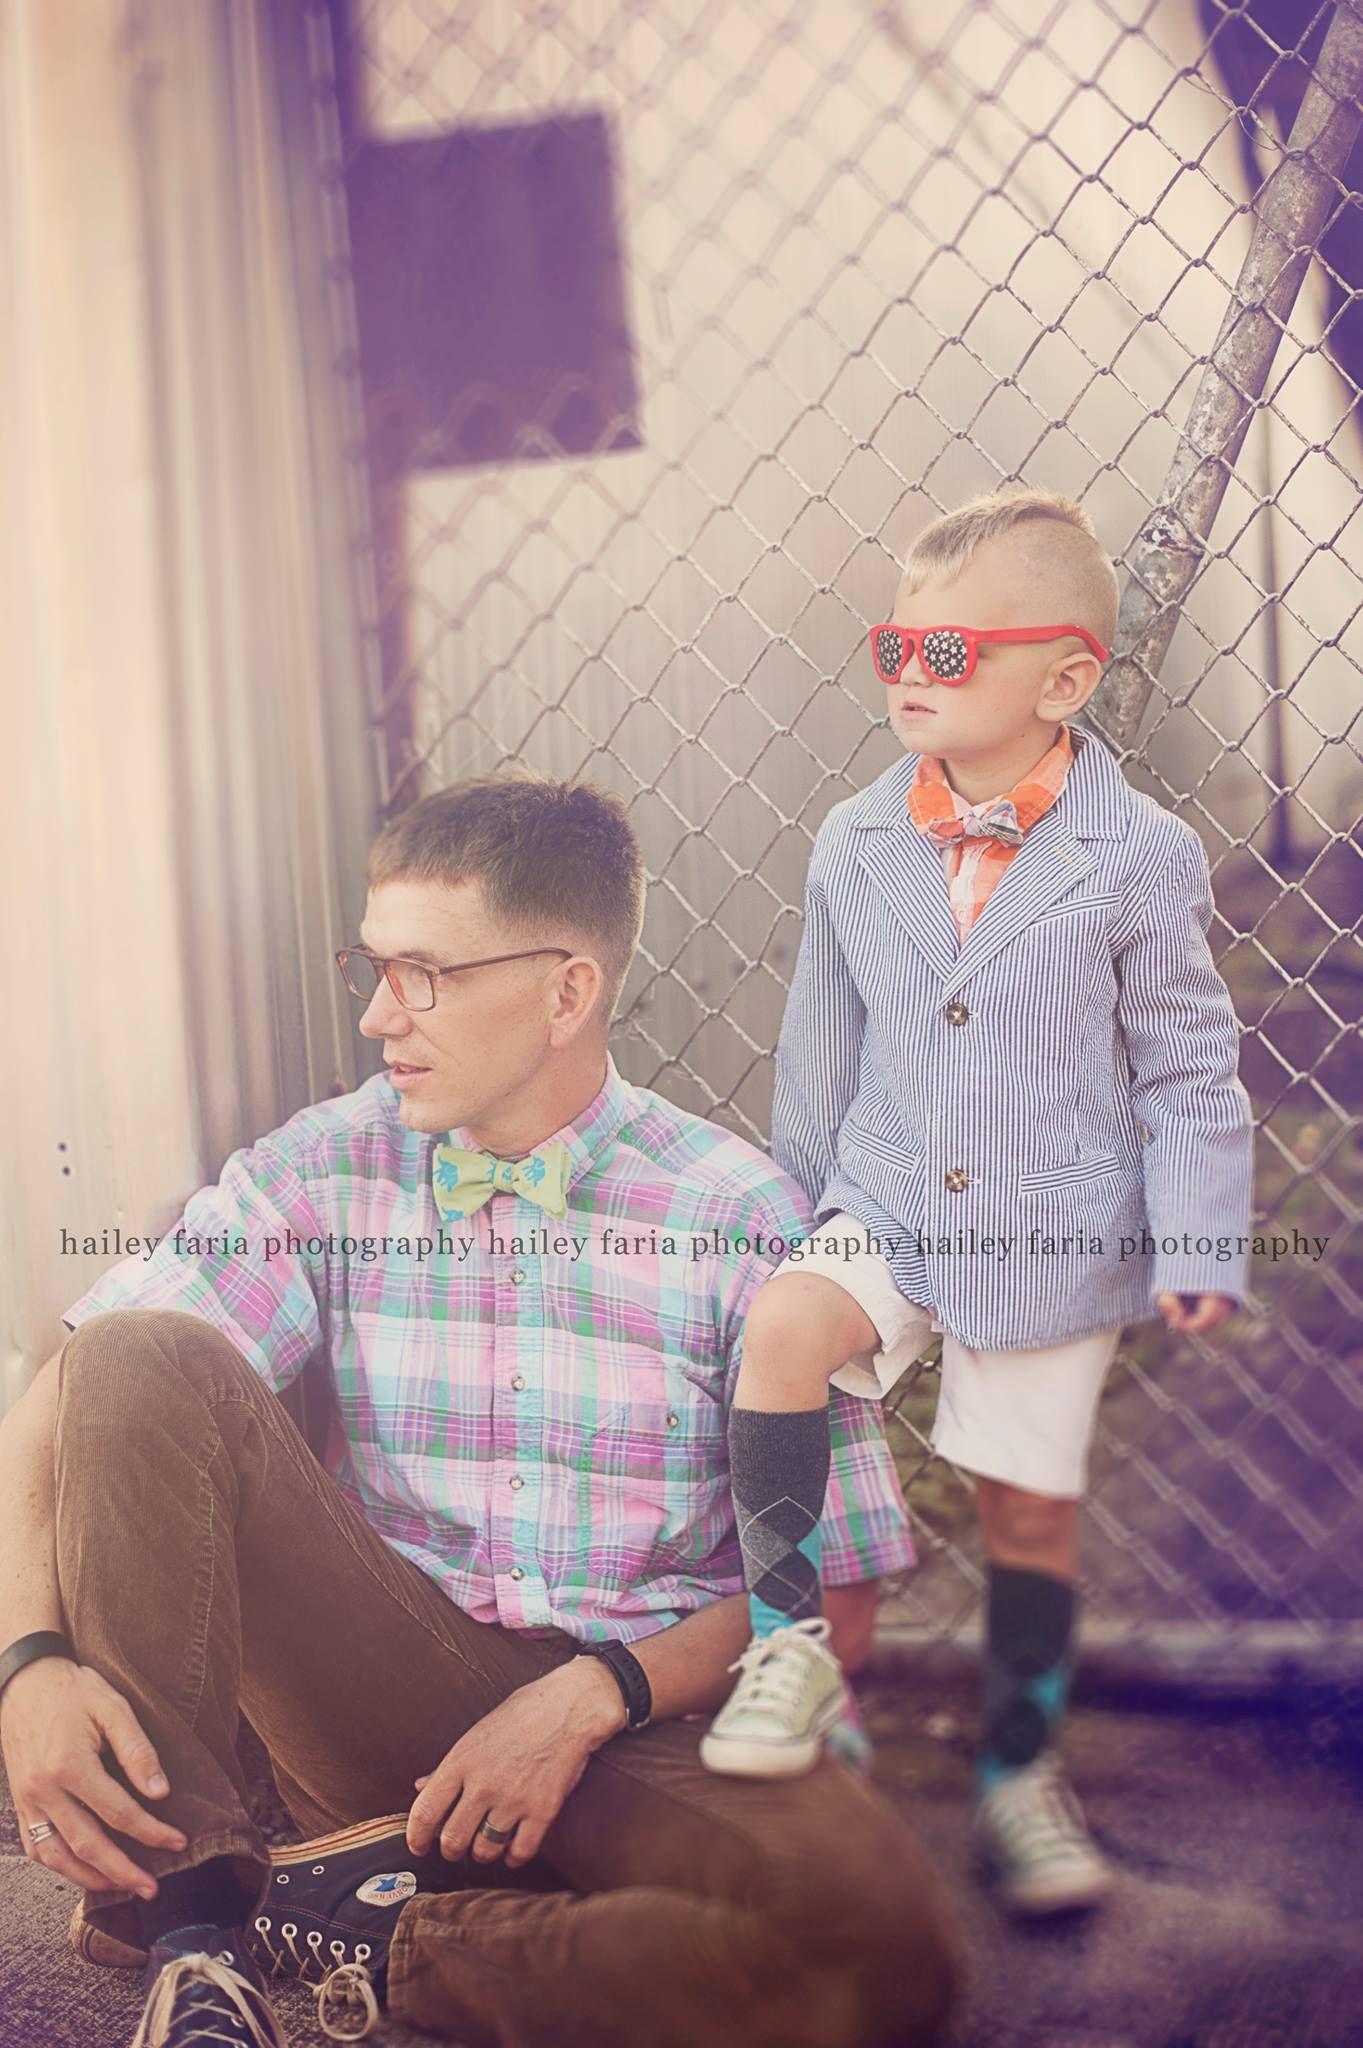 Shorts jacket and glasses kids fashion boys pinterest